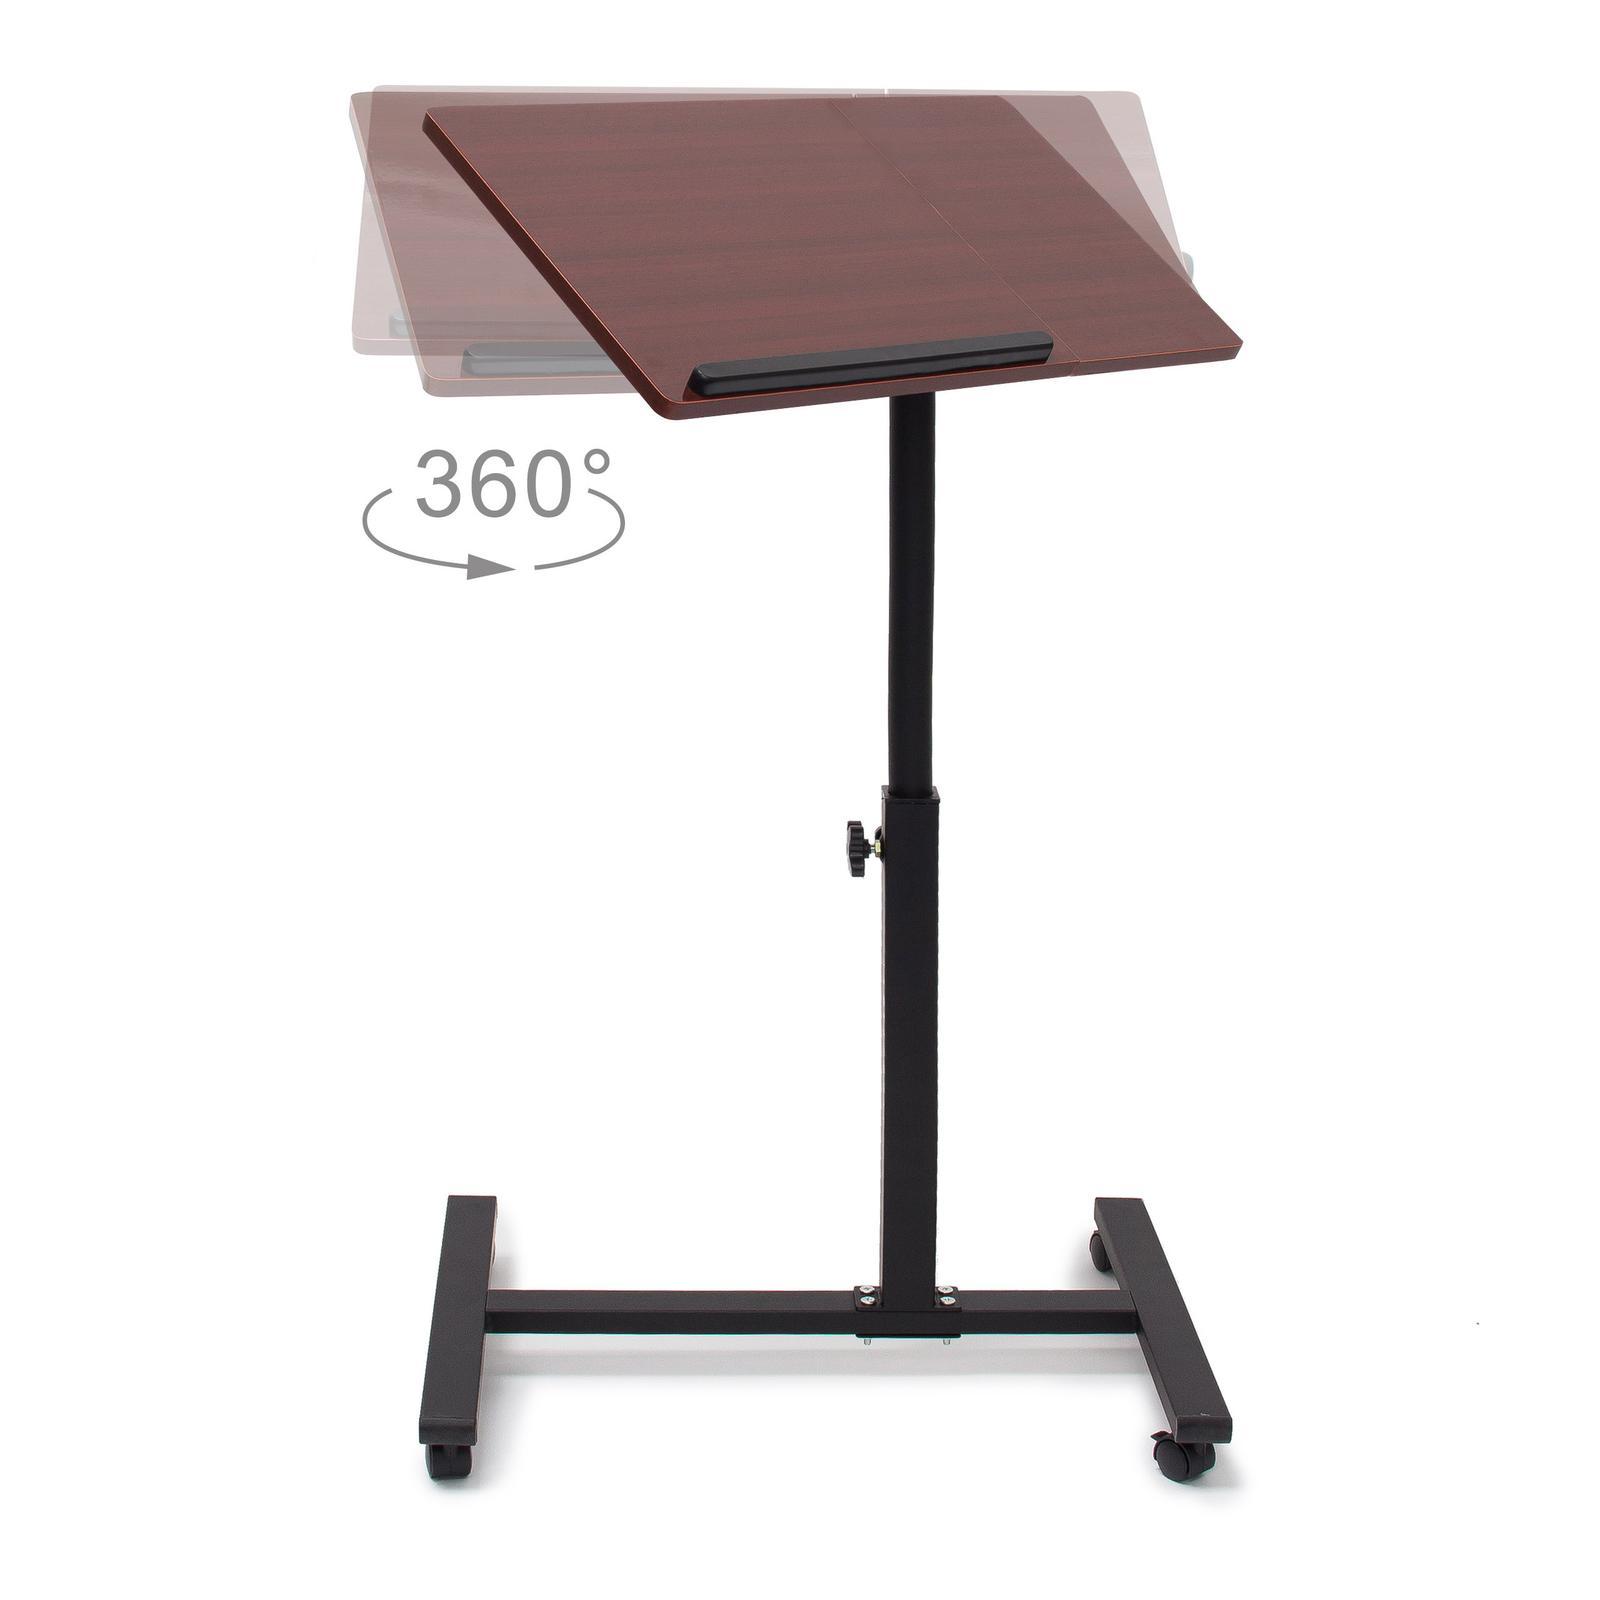 Stolík pre notebook, raňajkové stolíky - Obrázok č. 12